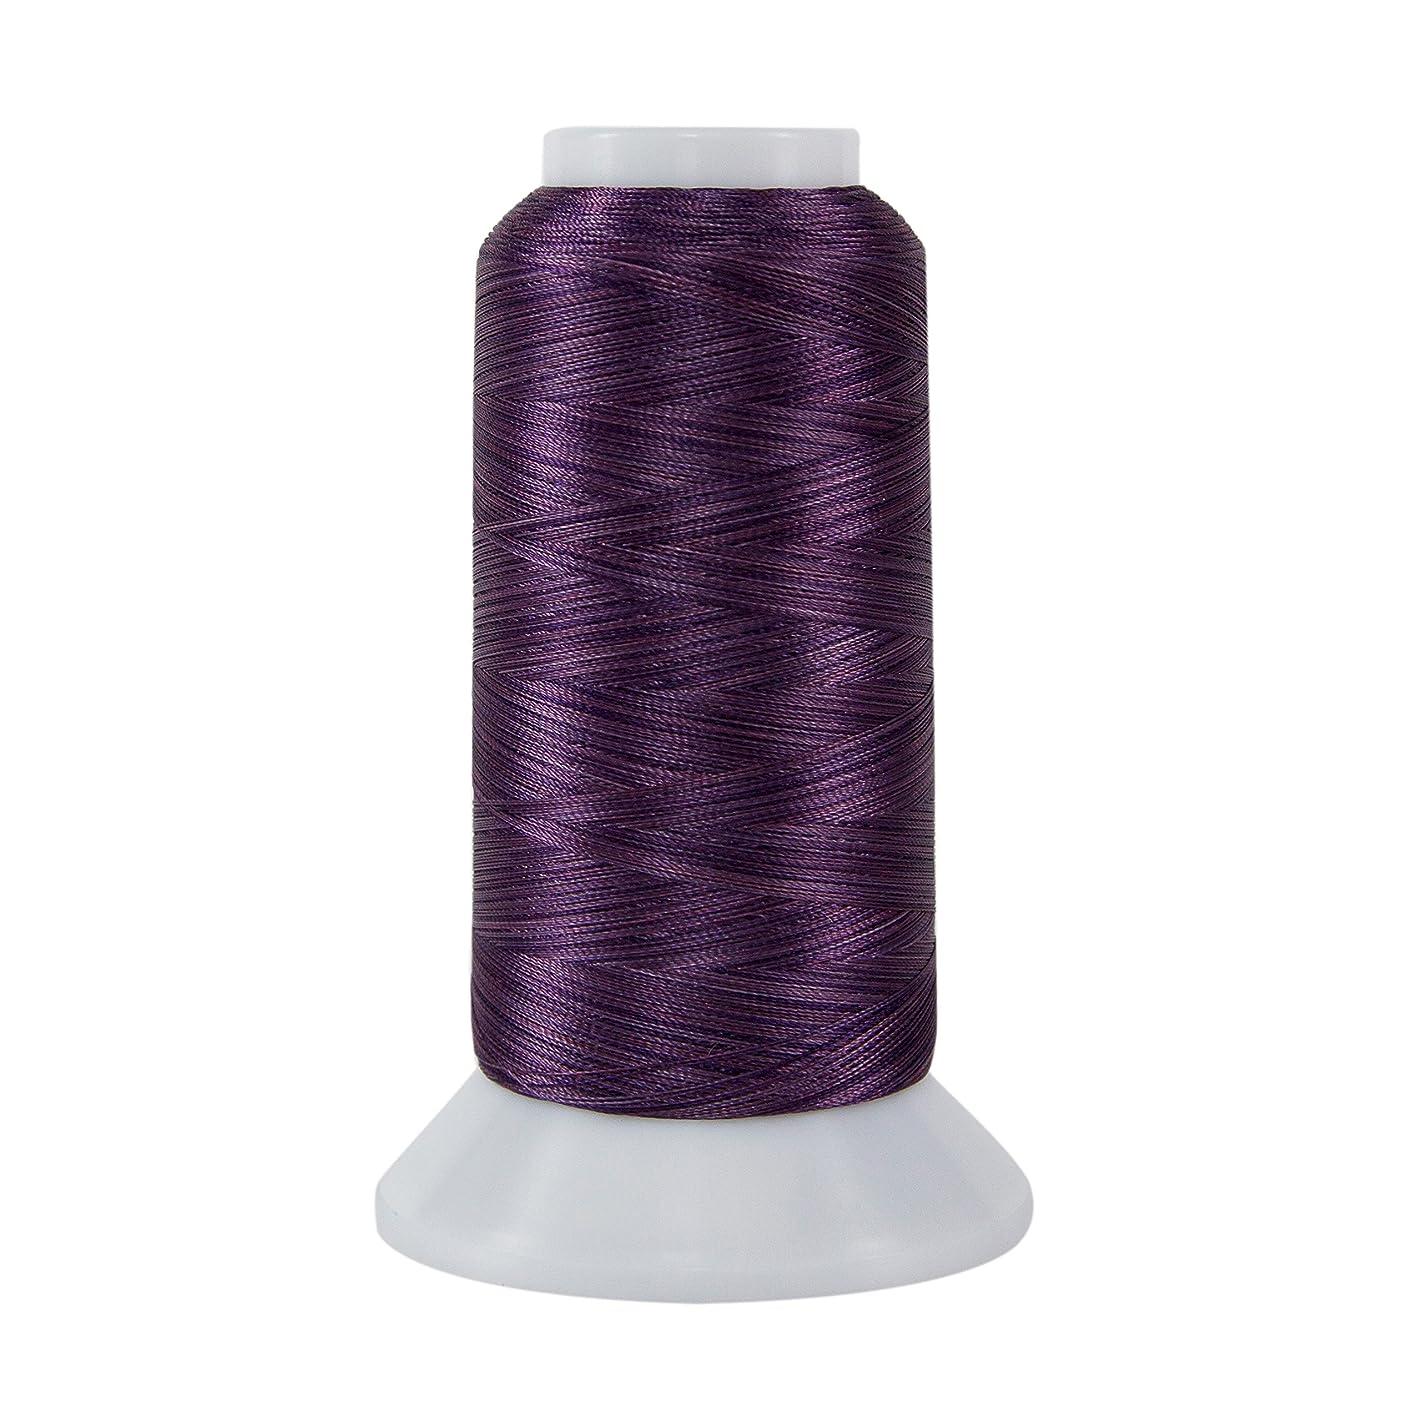 Superior Threads 11002-830 Rainbows Victorian Choice 40W Polyester Thread, 2000 yd